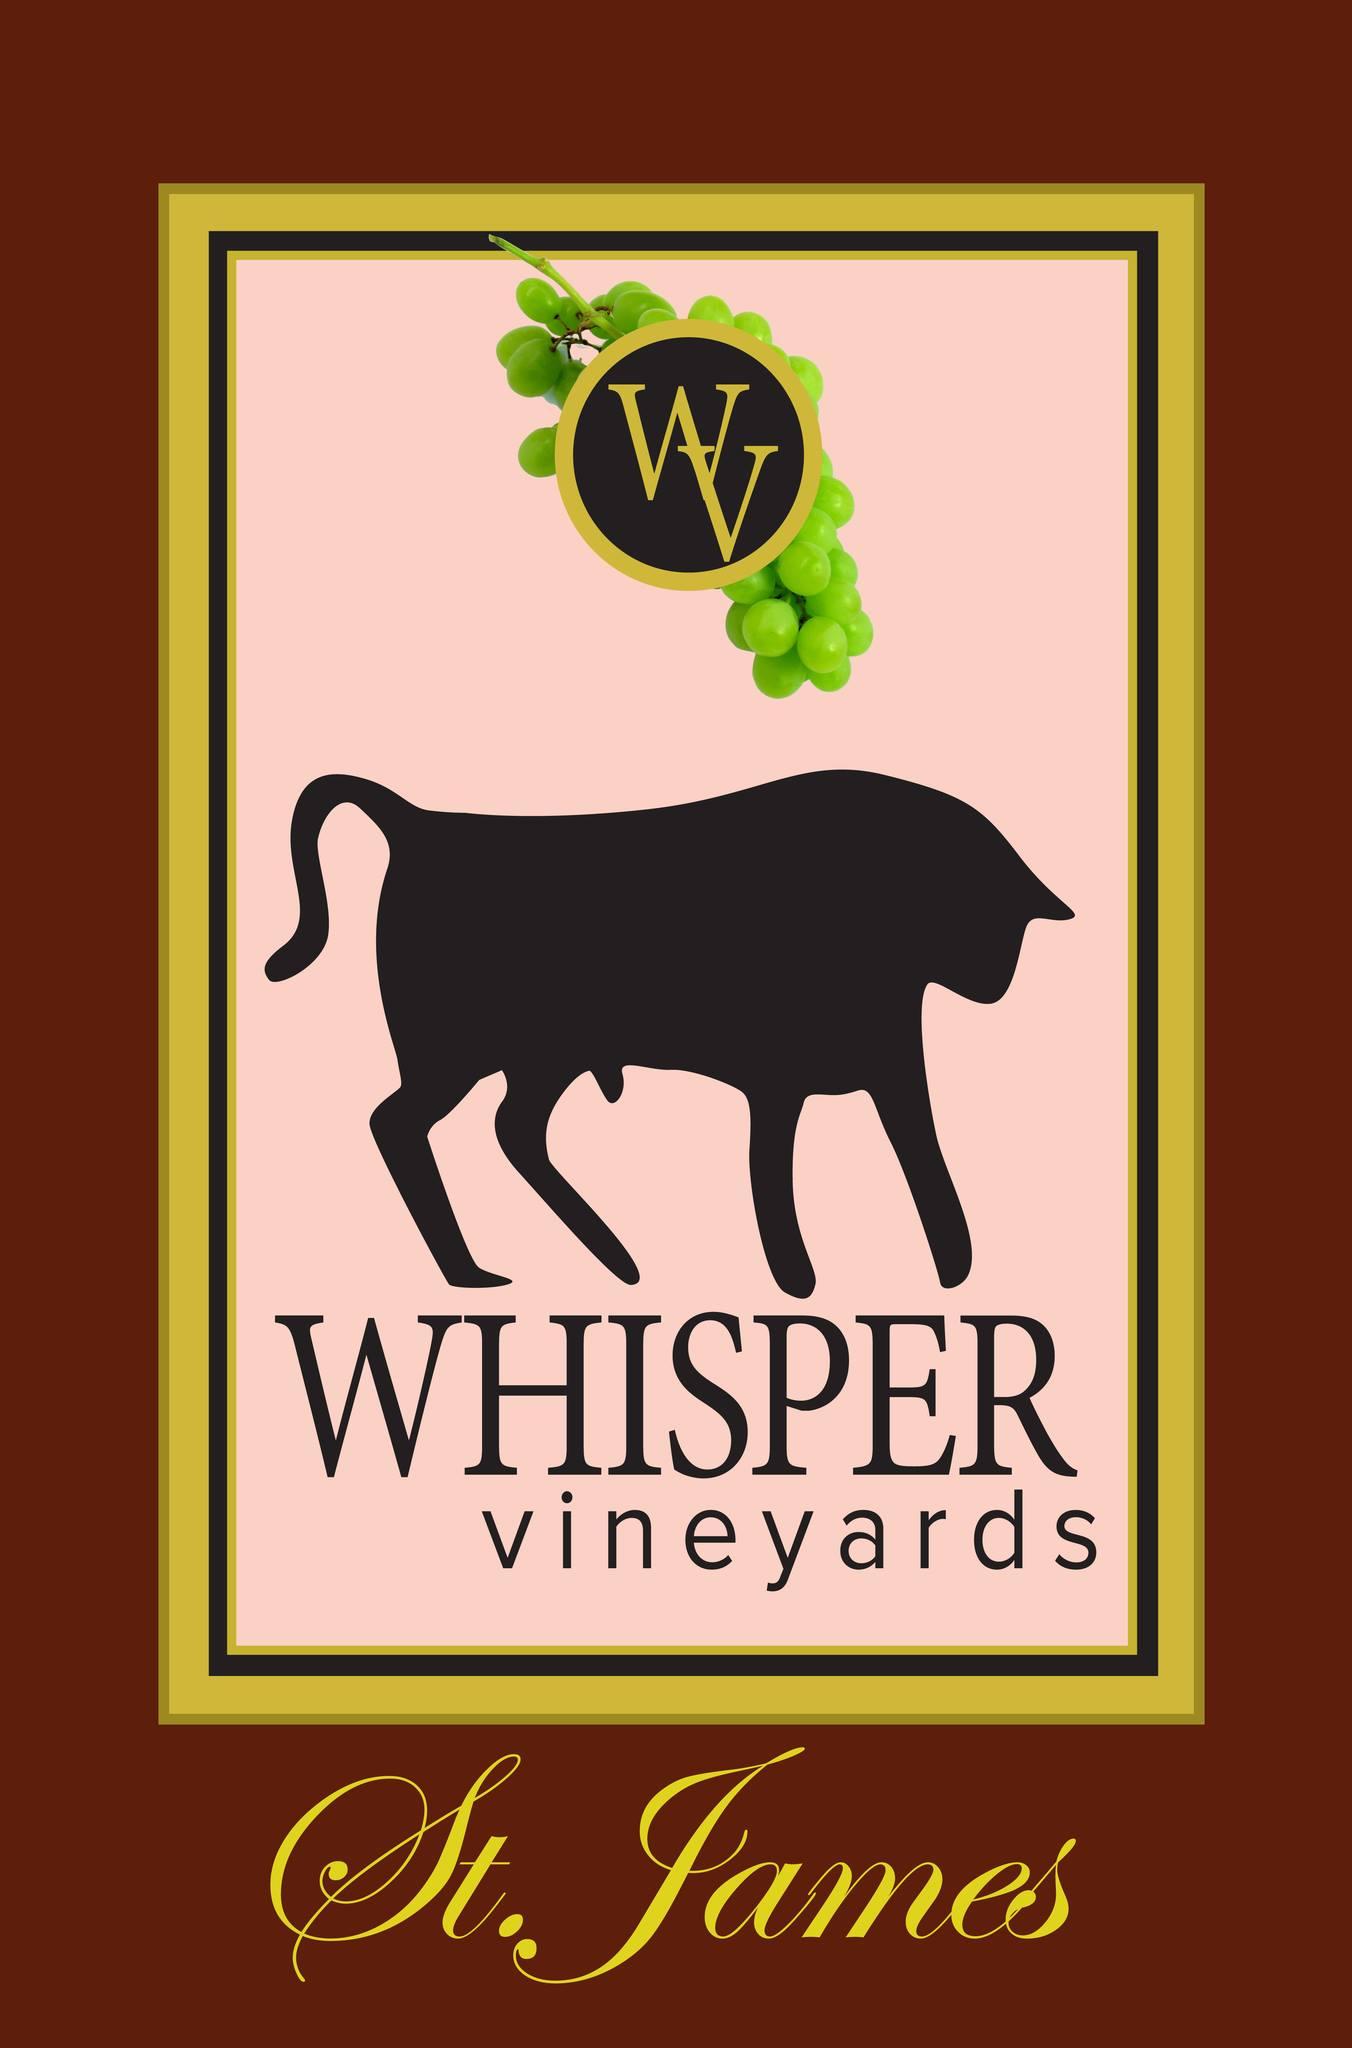 WhisperVineyards